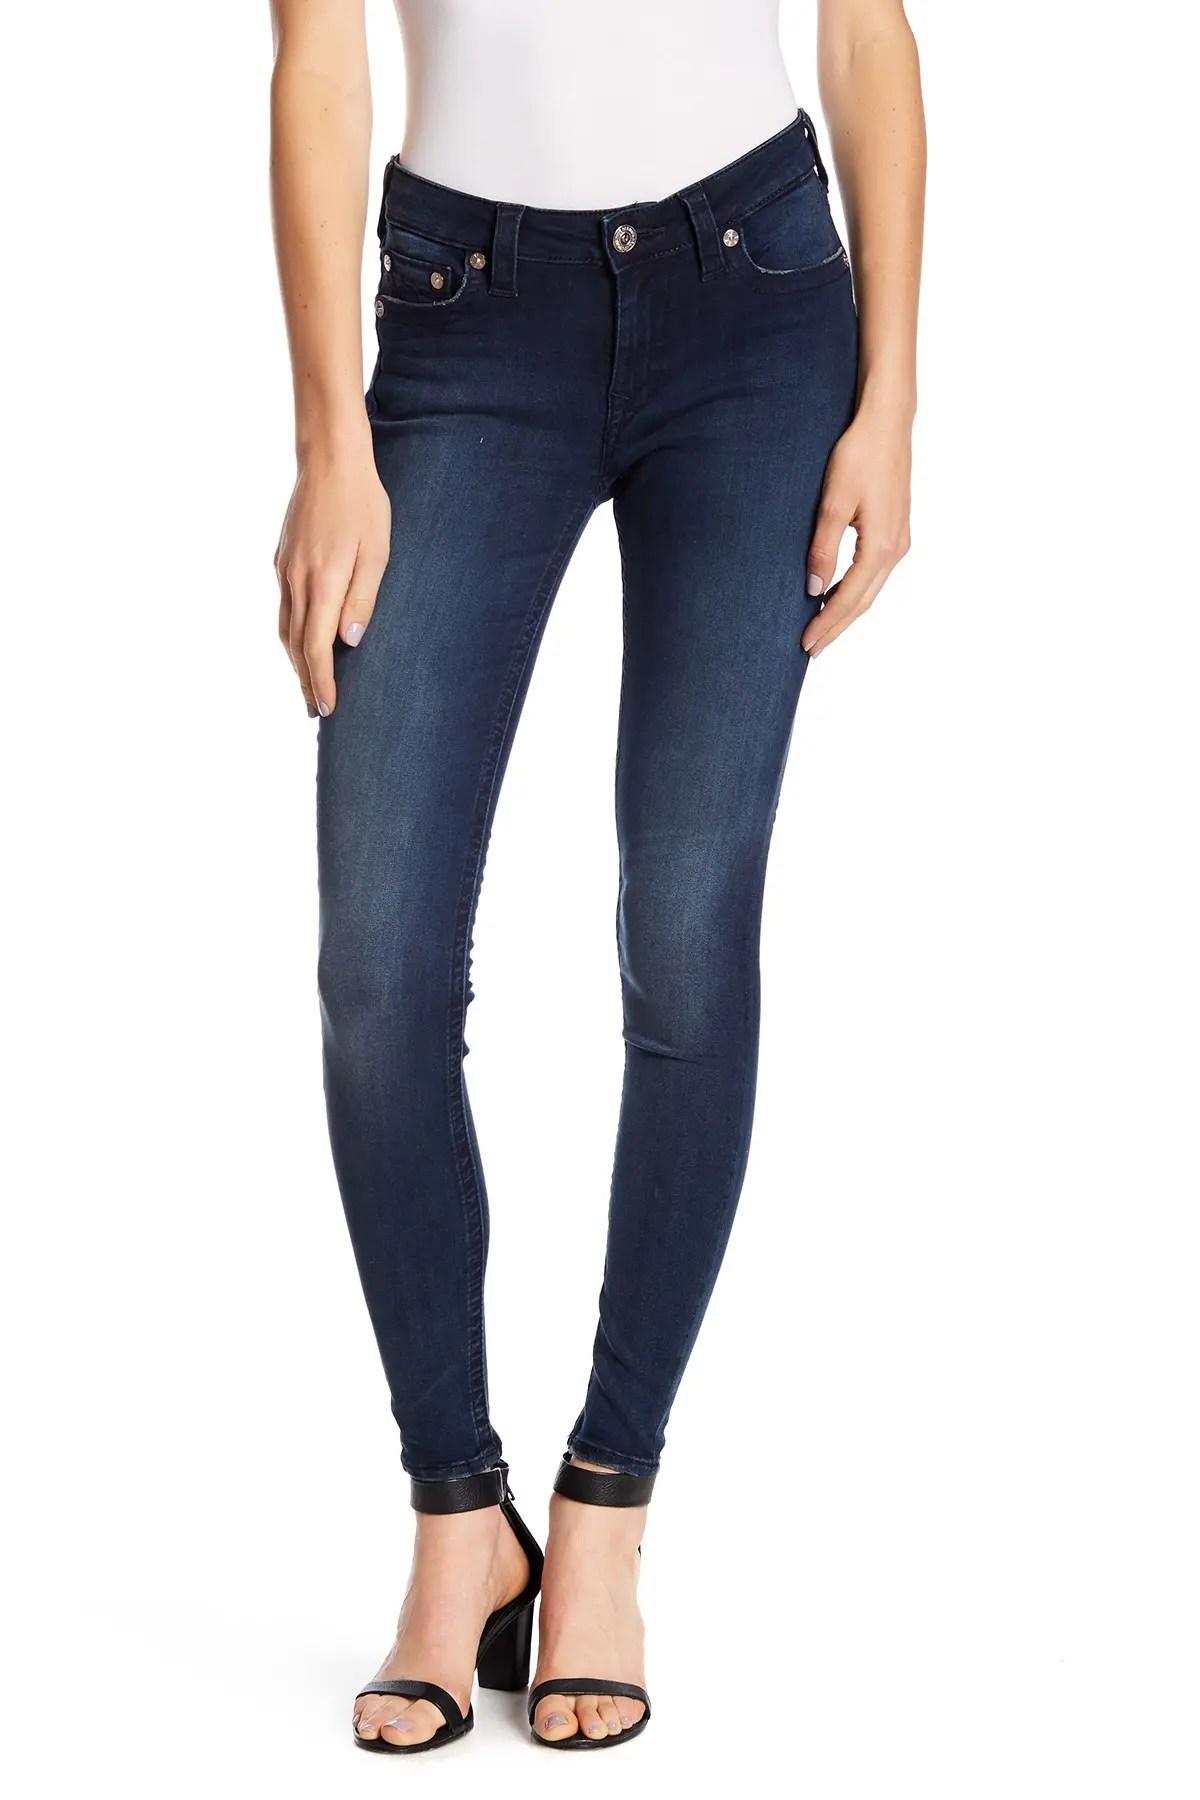 true religion crystal pocket curvy skinny jeans nordstrom rack